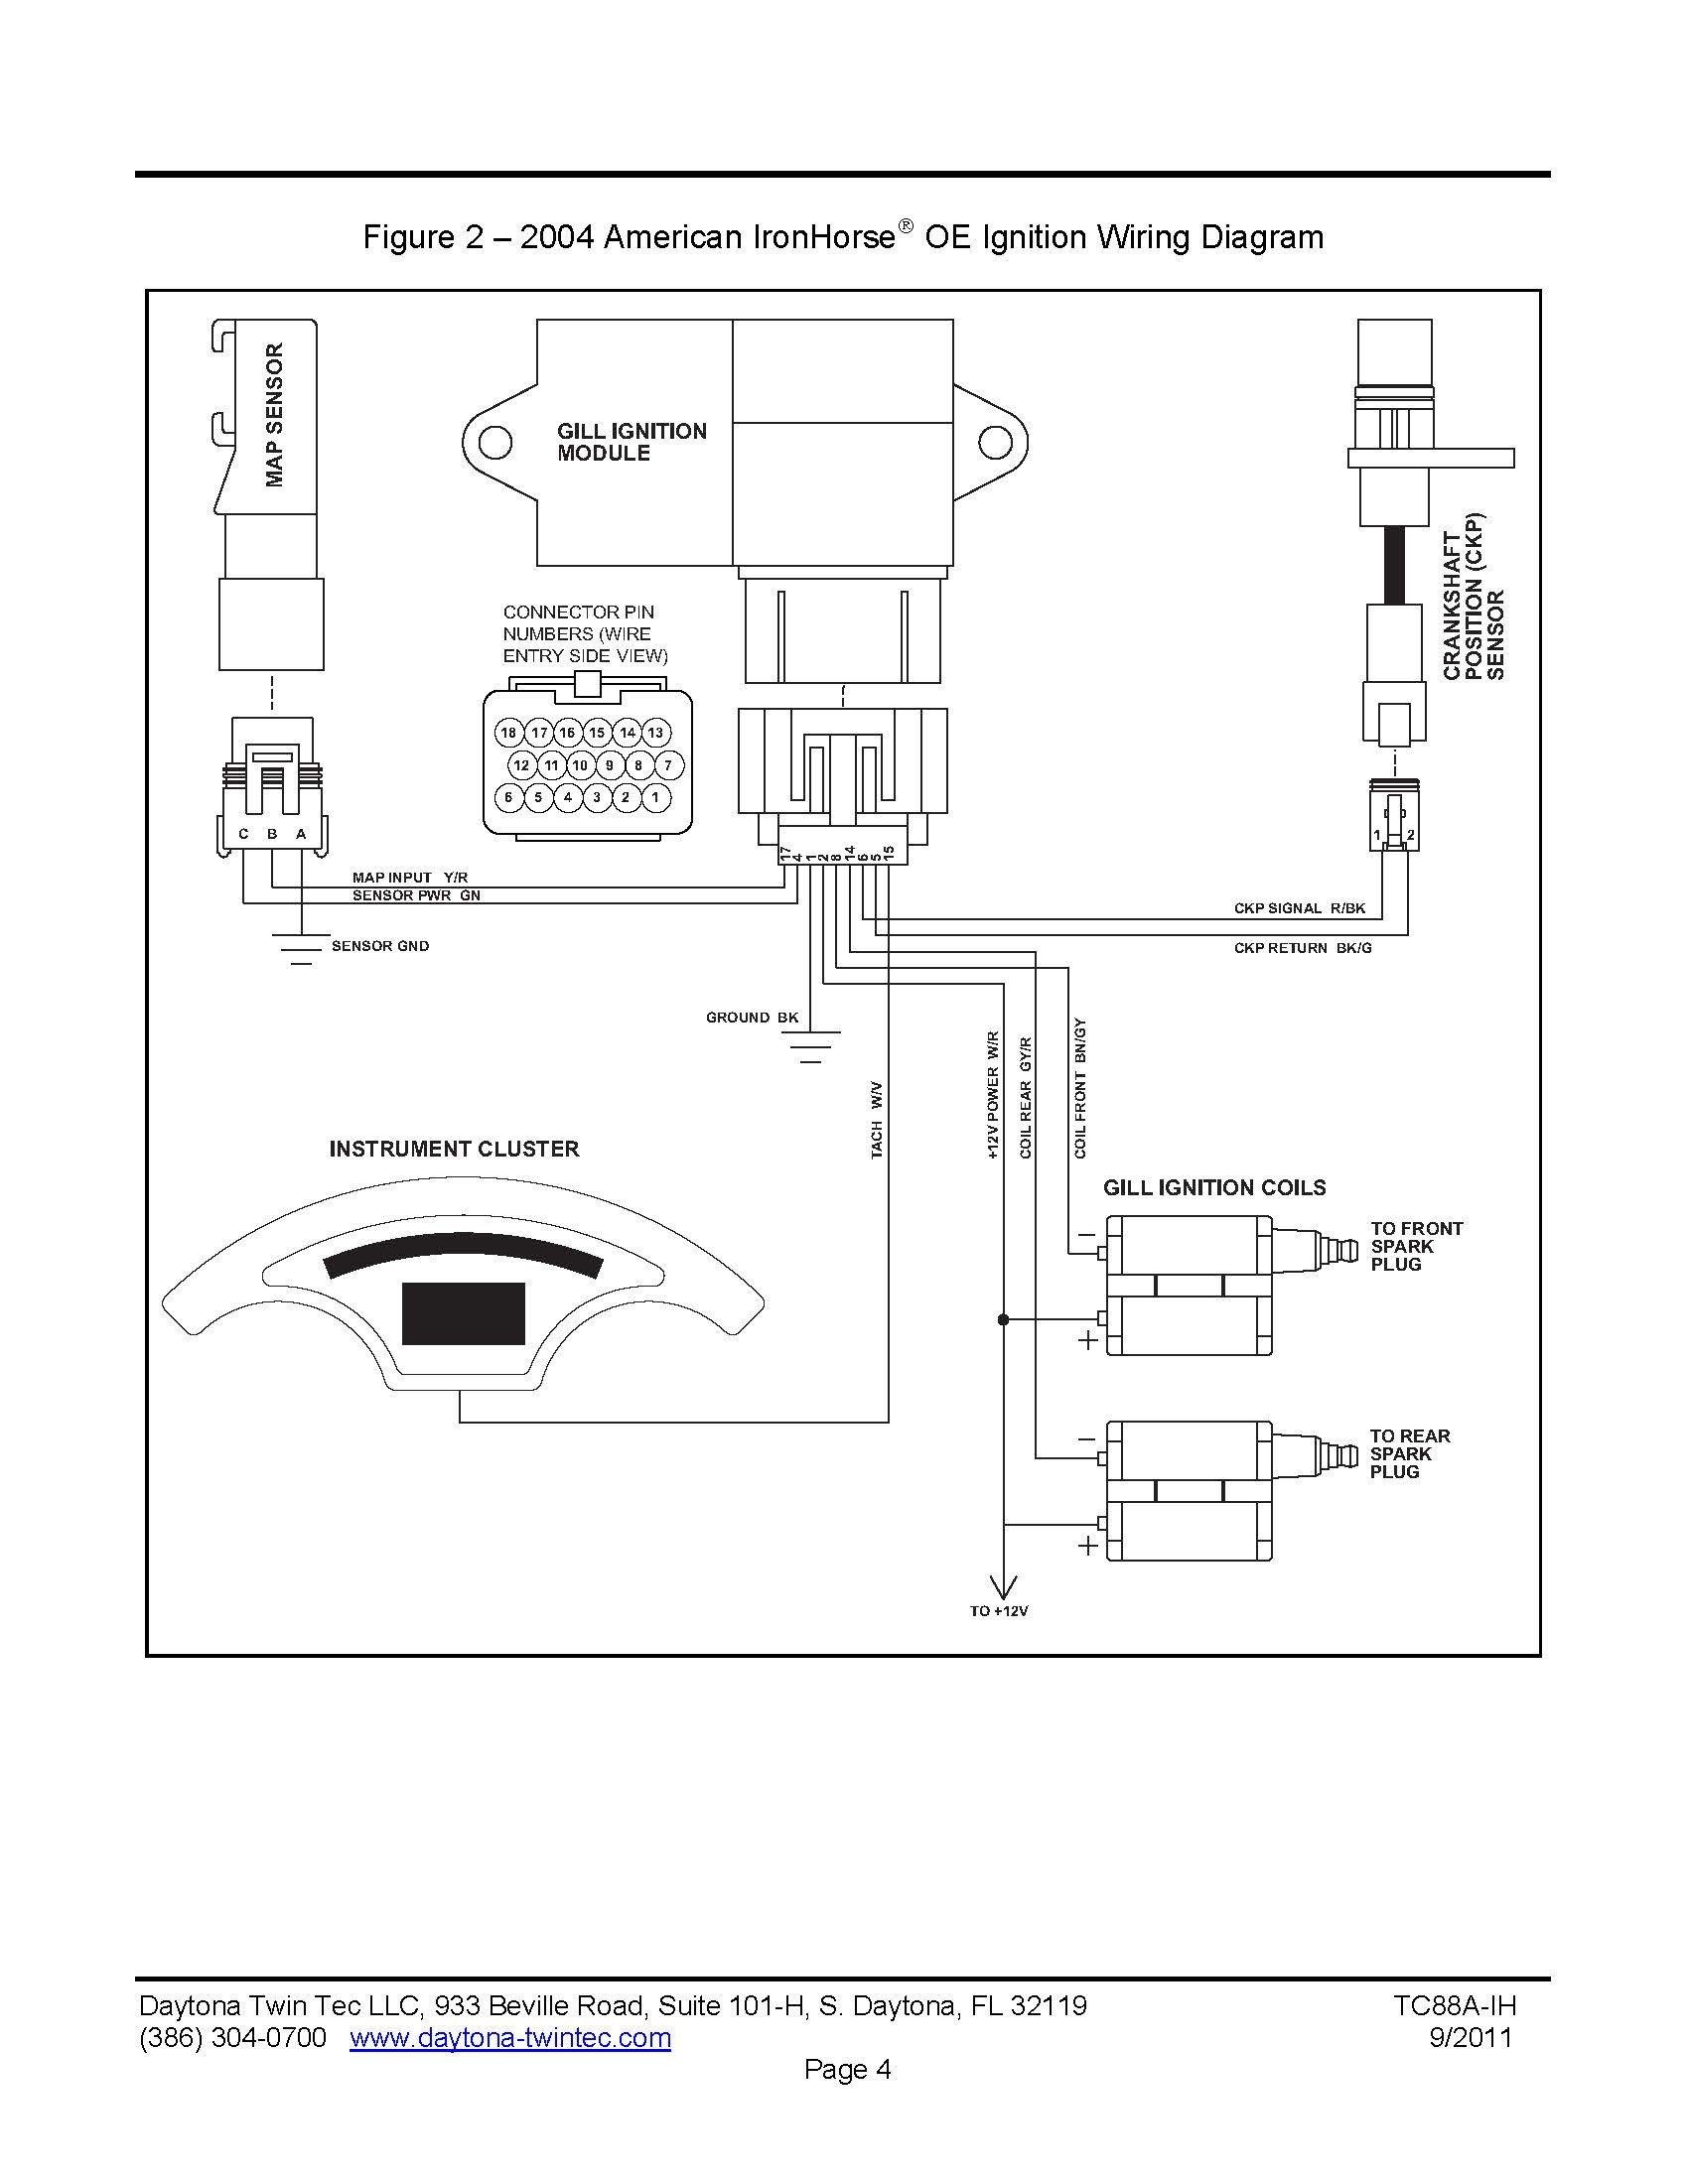 Wiring Diagram For 2003 Texas Ironhorse Motorcycle